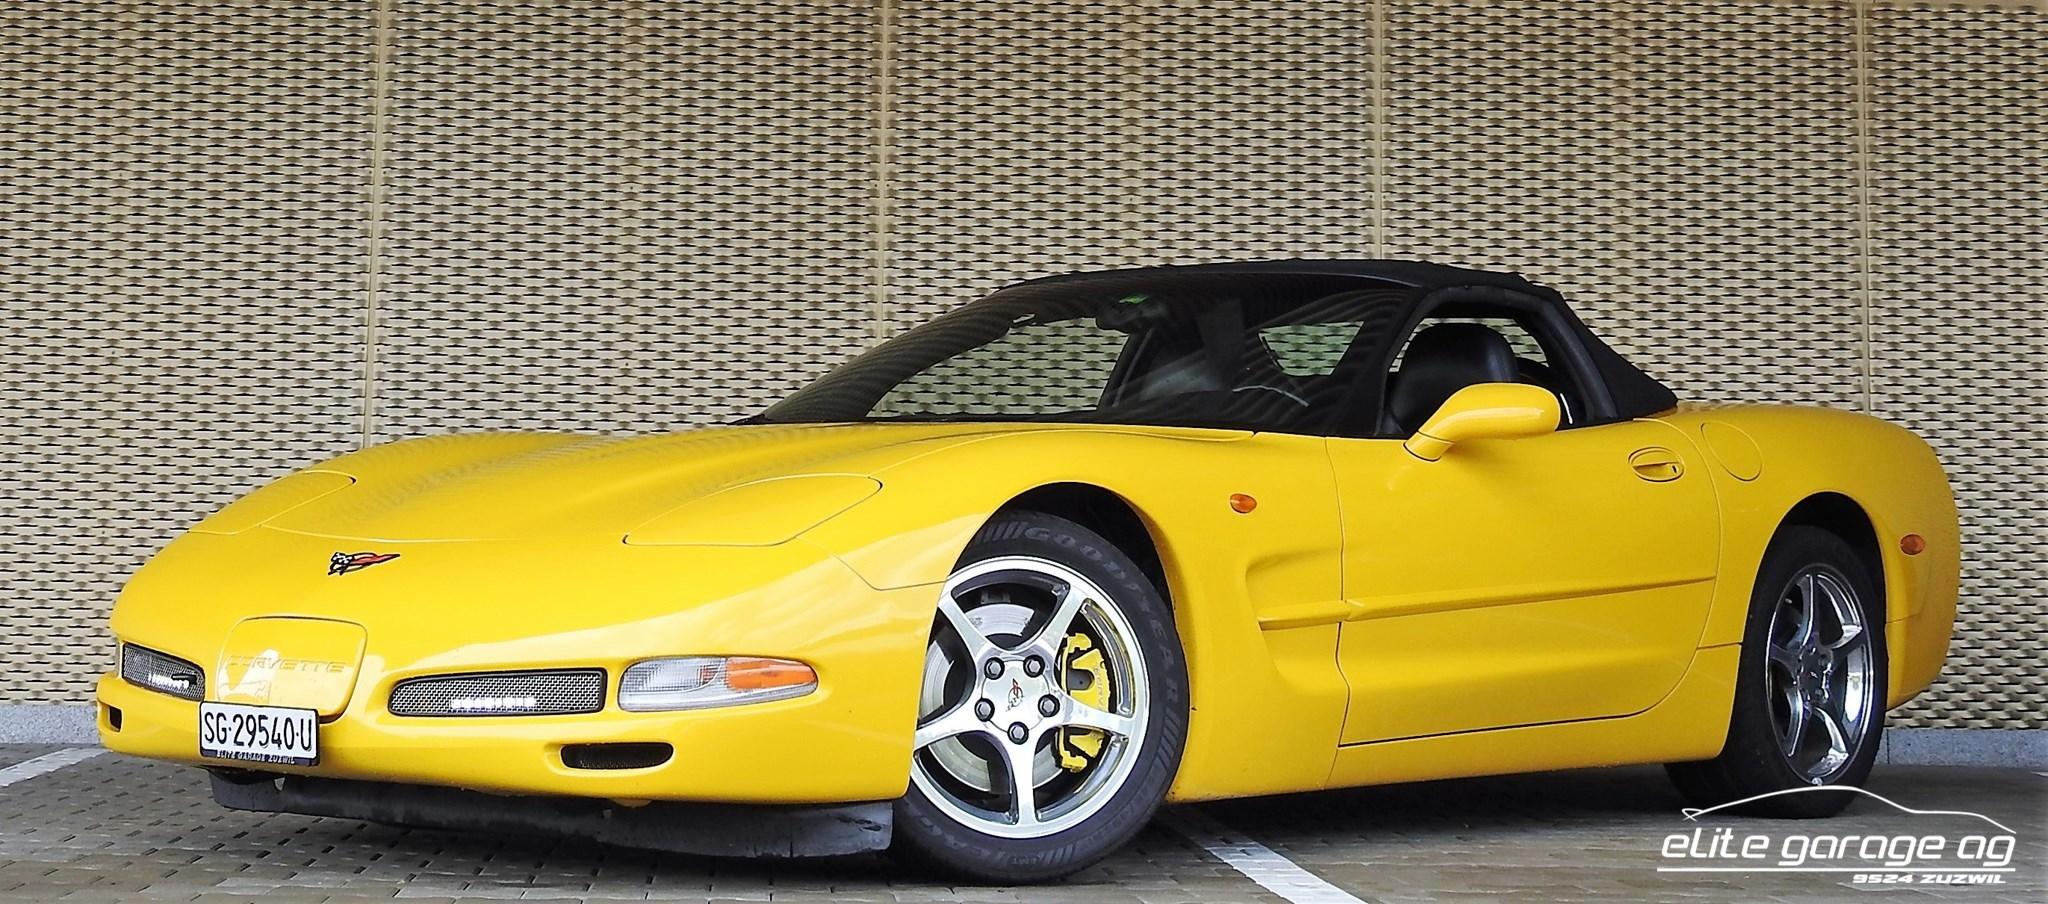 cabriolet Chevrolet Corvette 5.7 LS1 Convertible A